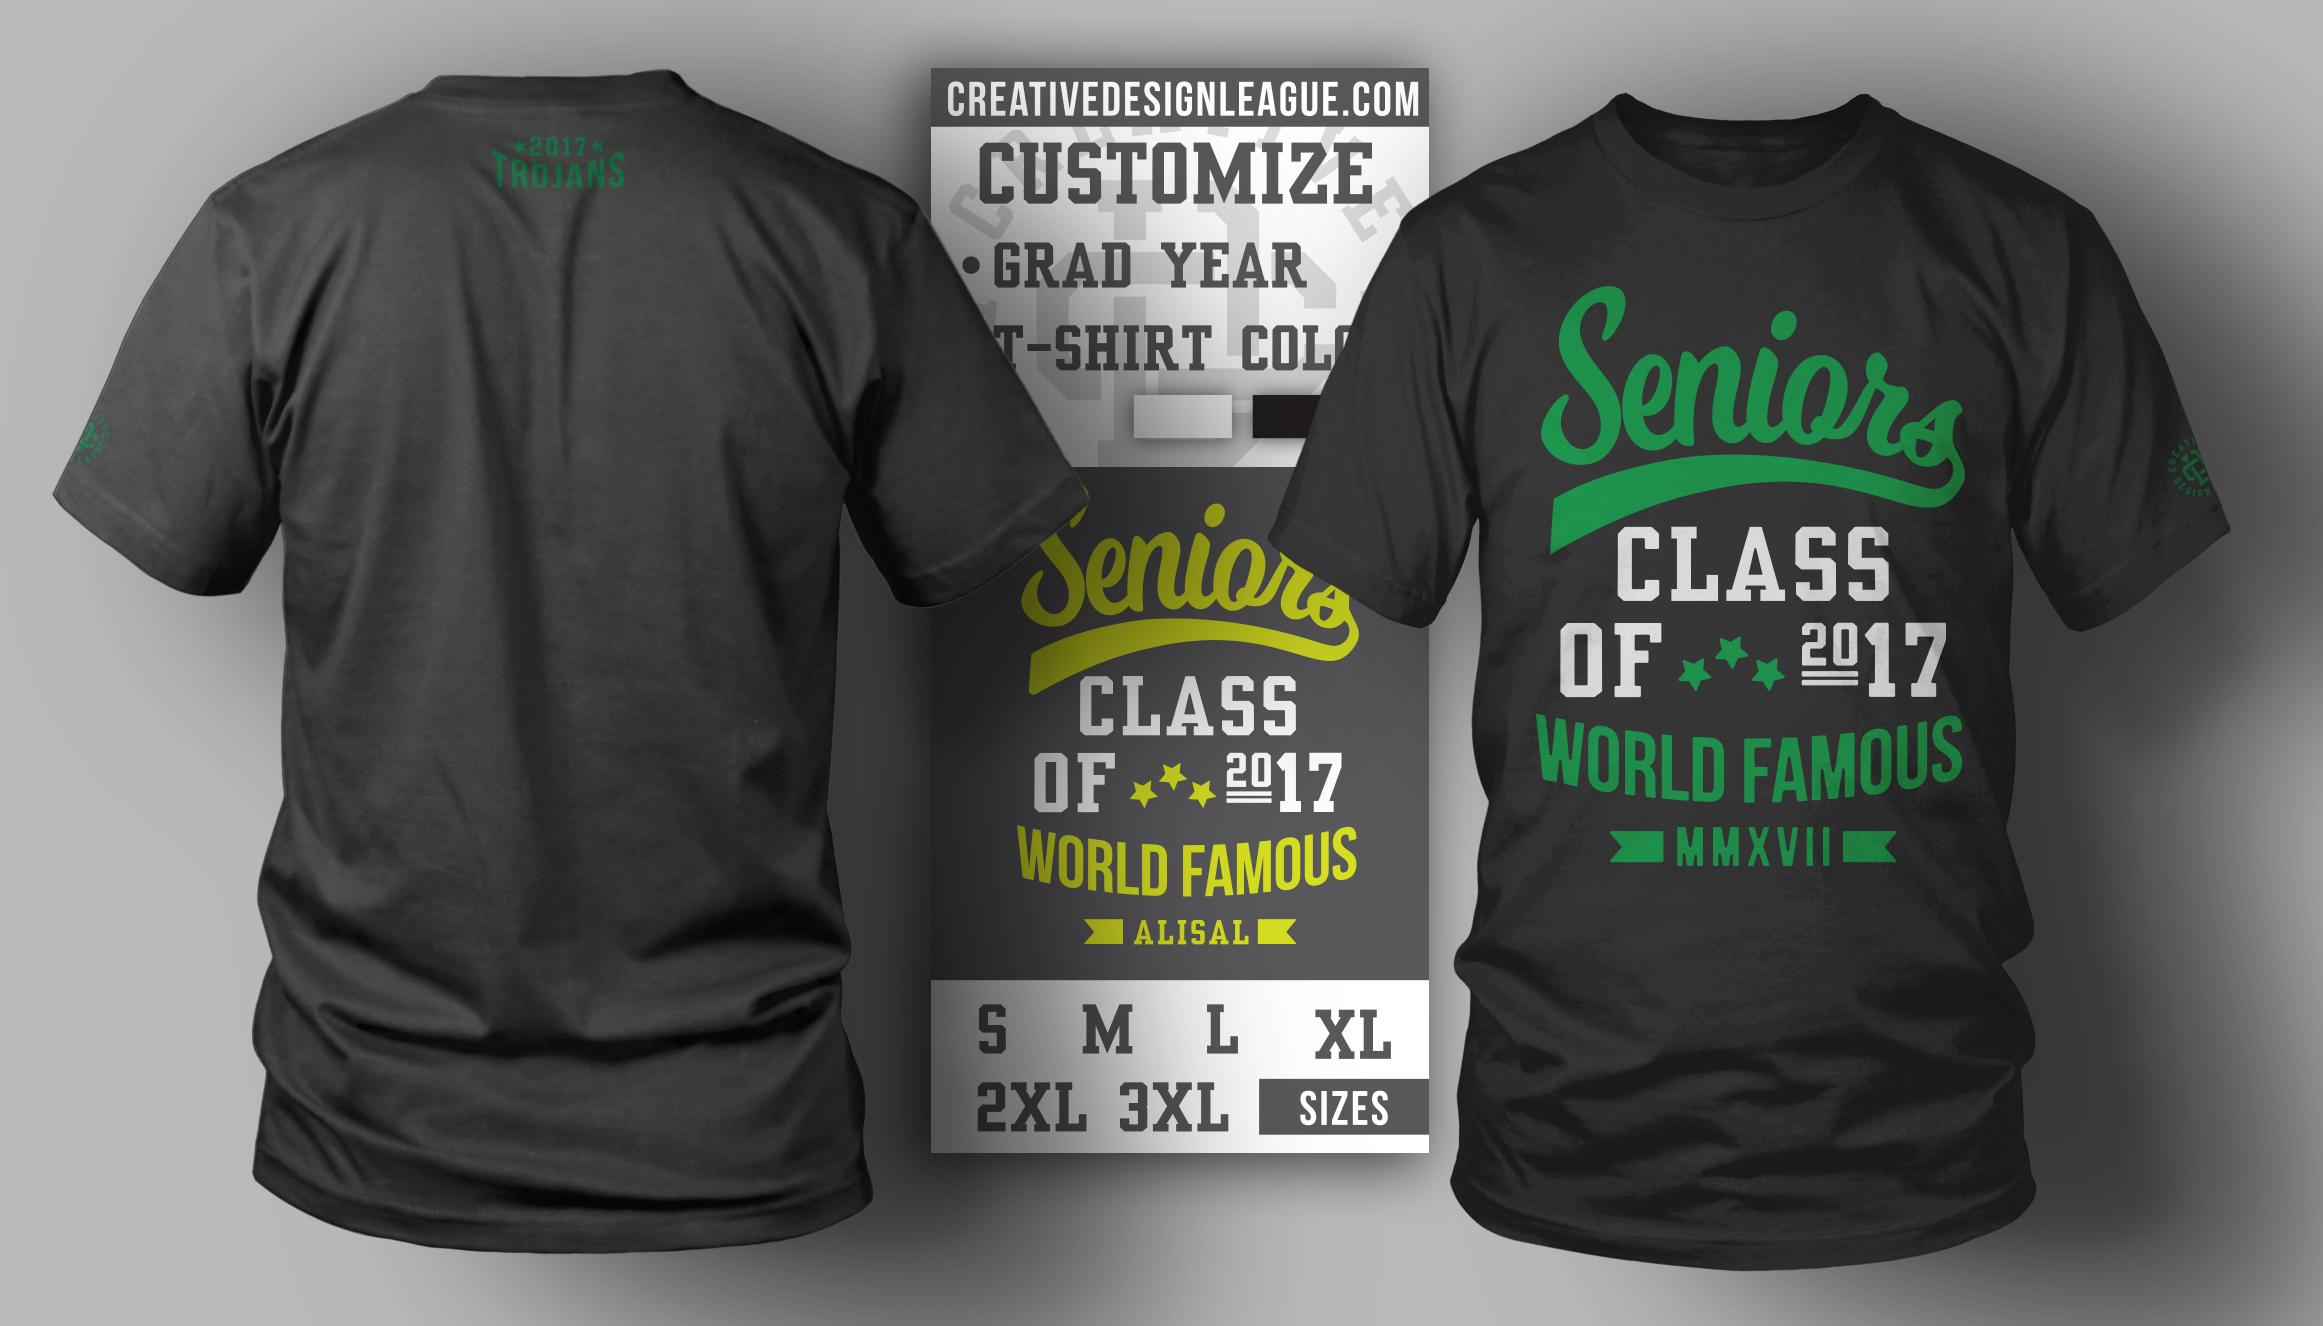 f78cf327e Customize Graphic T Shirts - DREAMWORKS